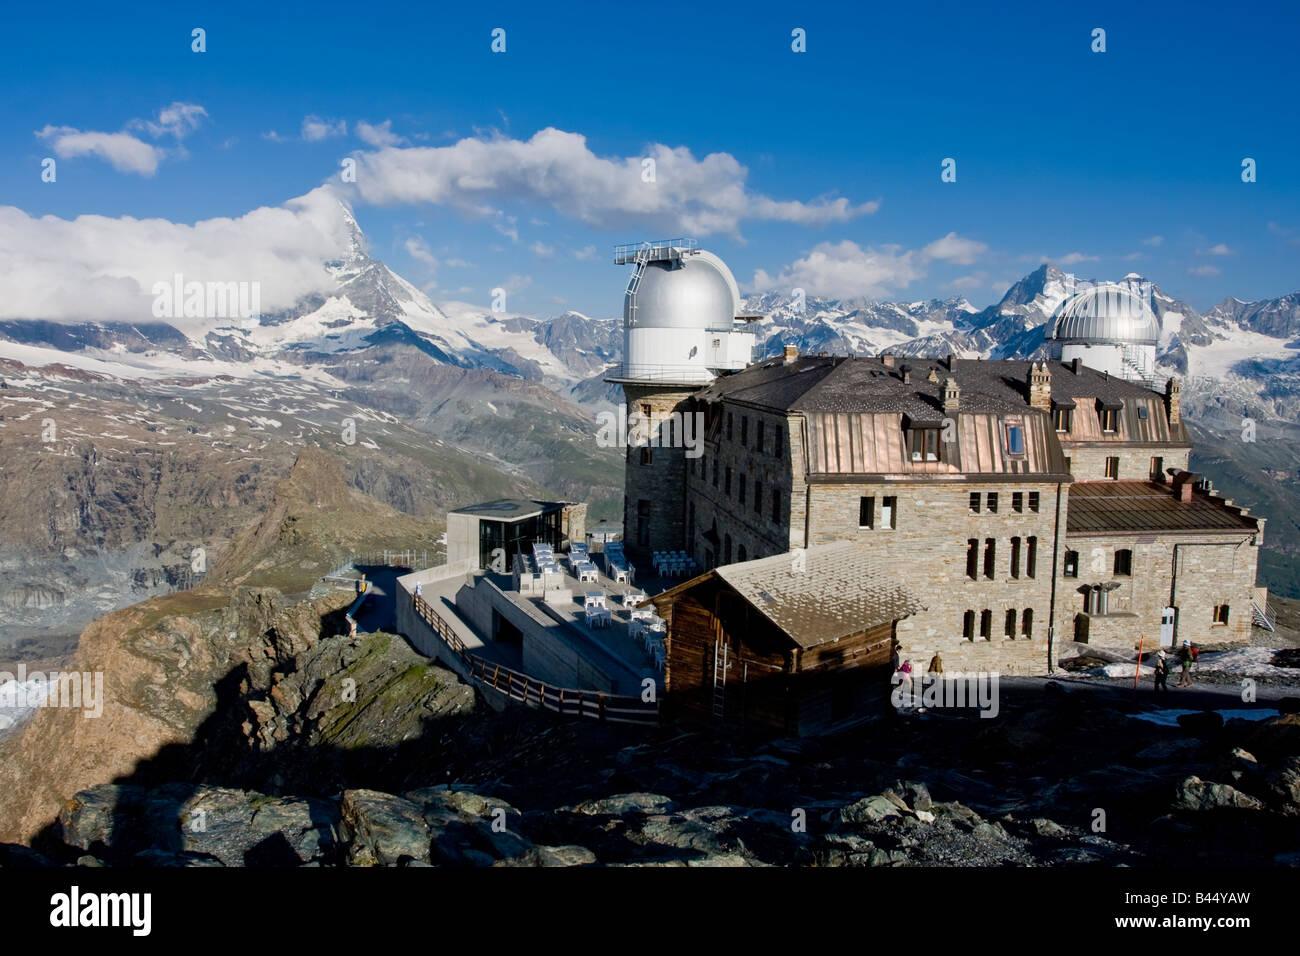 Gornergrat Hotel and mountain panorama - Stock Image